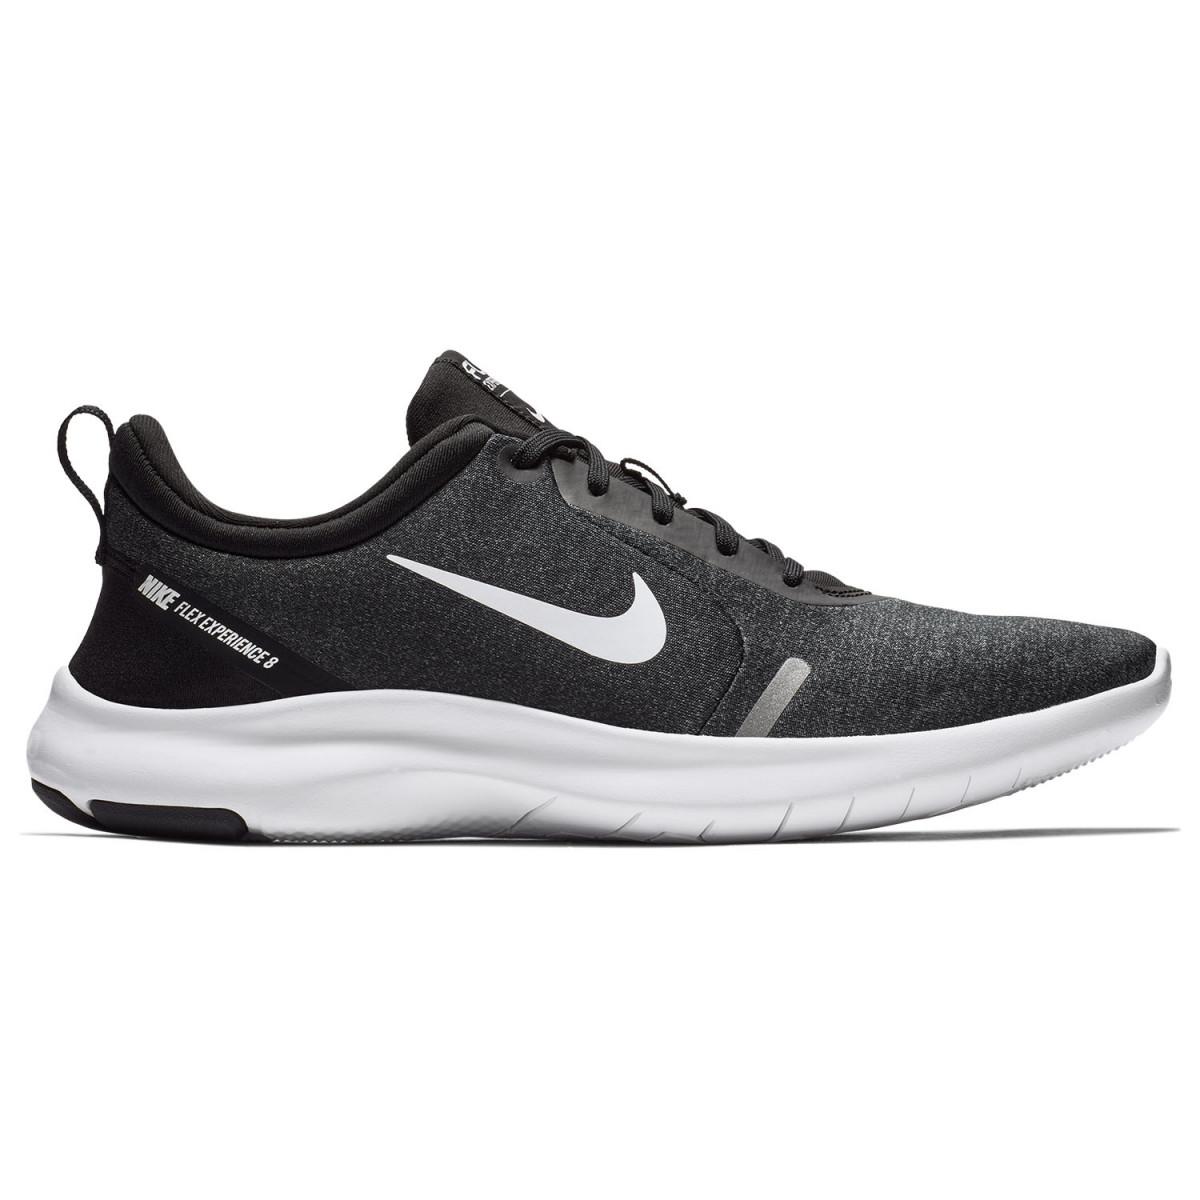 Zapatillas Nike Flex Experience Rn 8